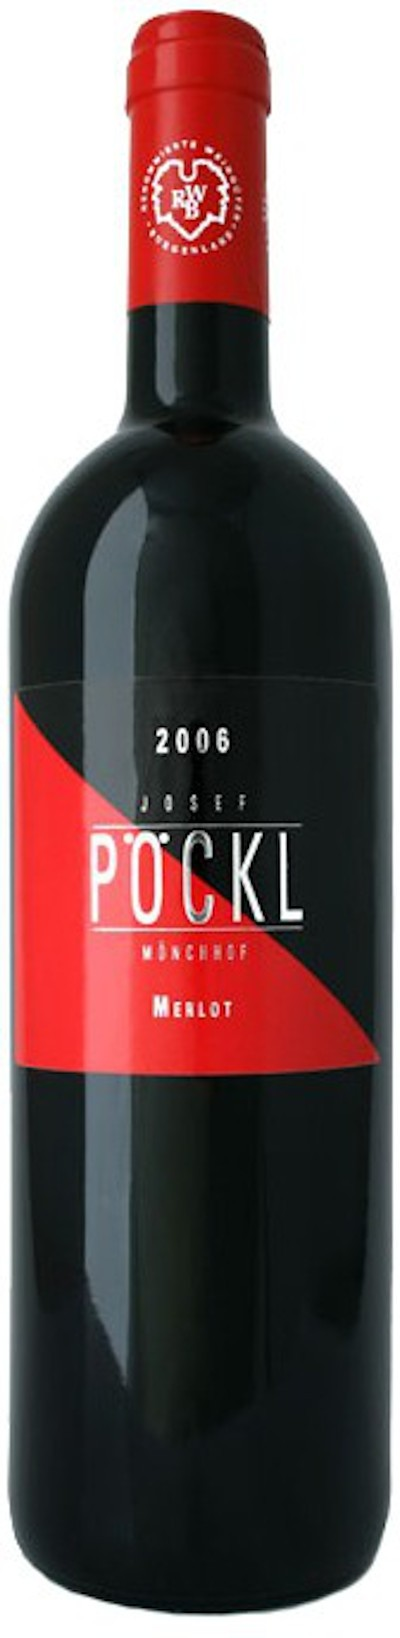 Pöckl - Rarität Merlot, 2012